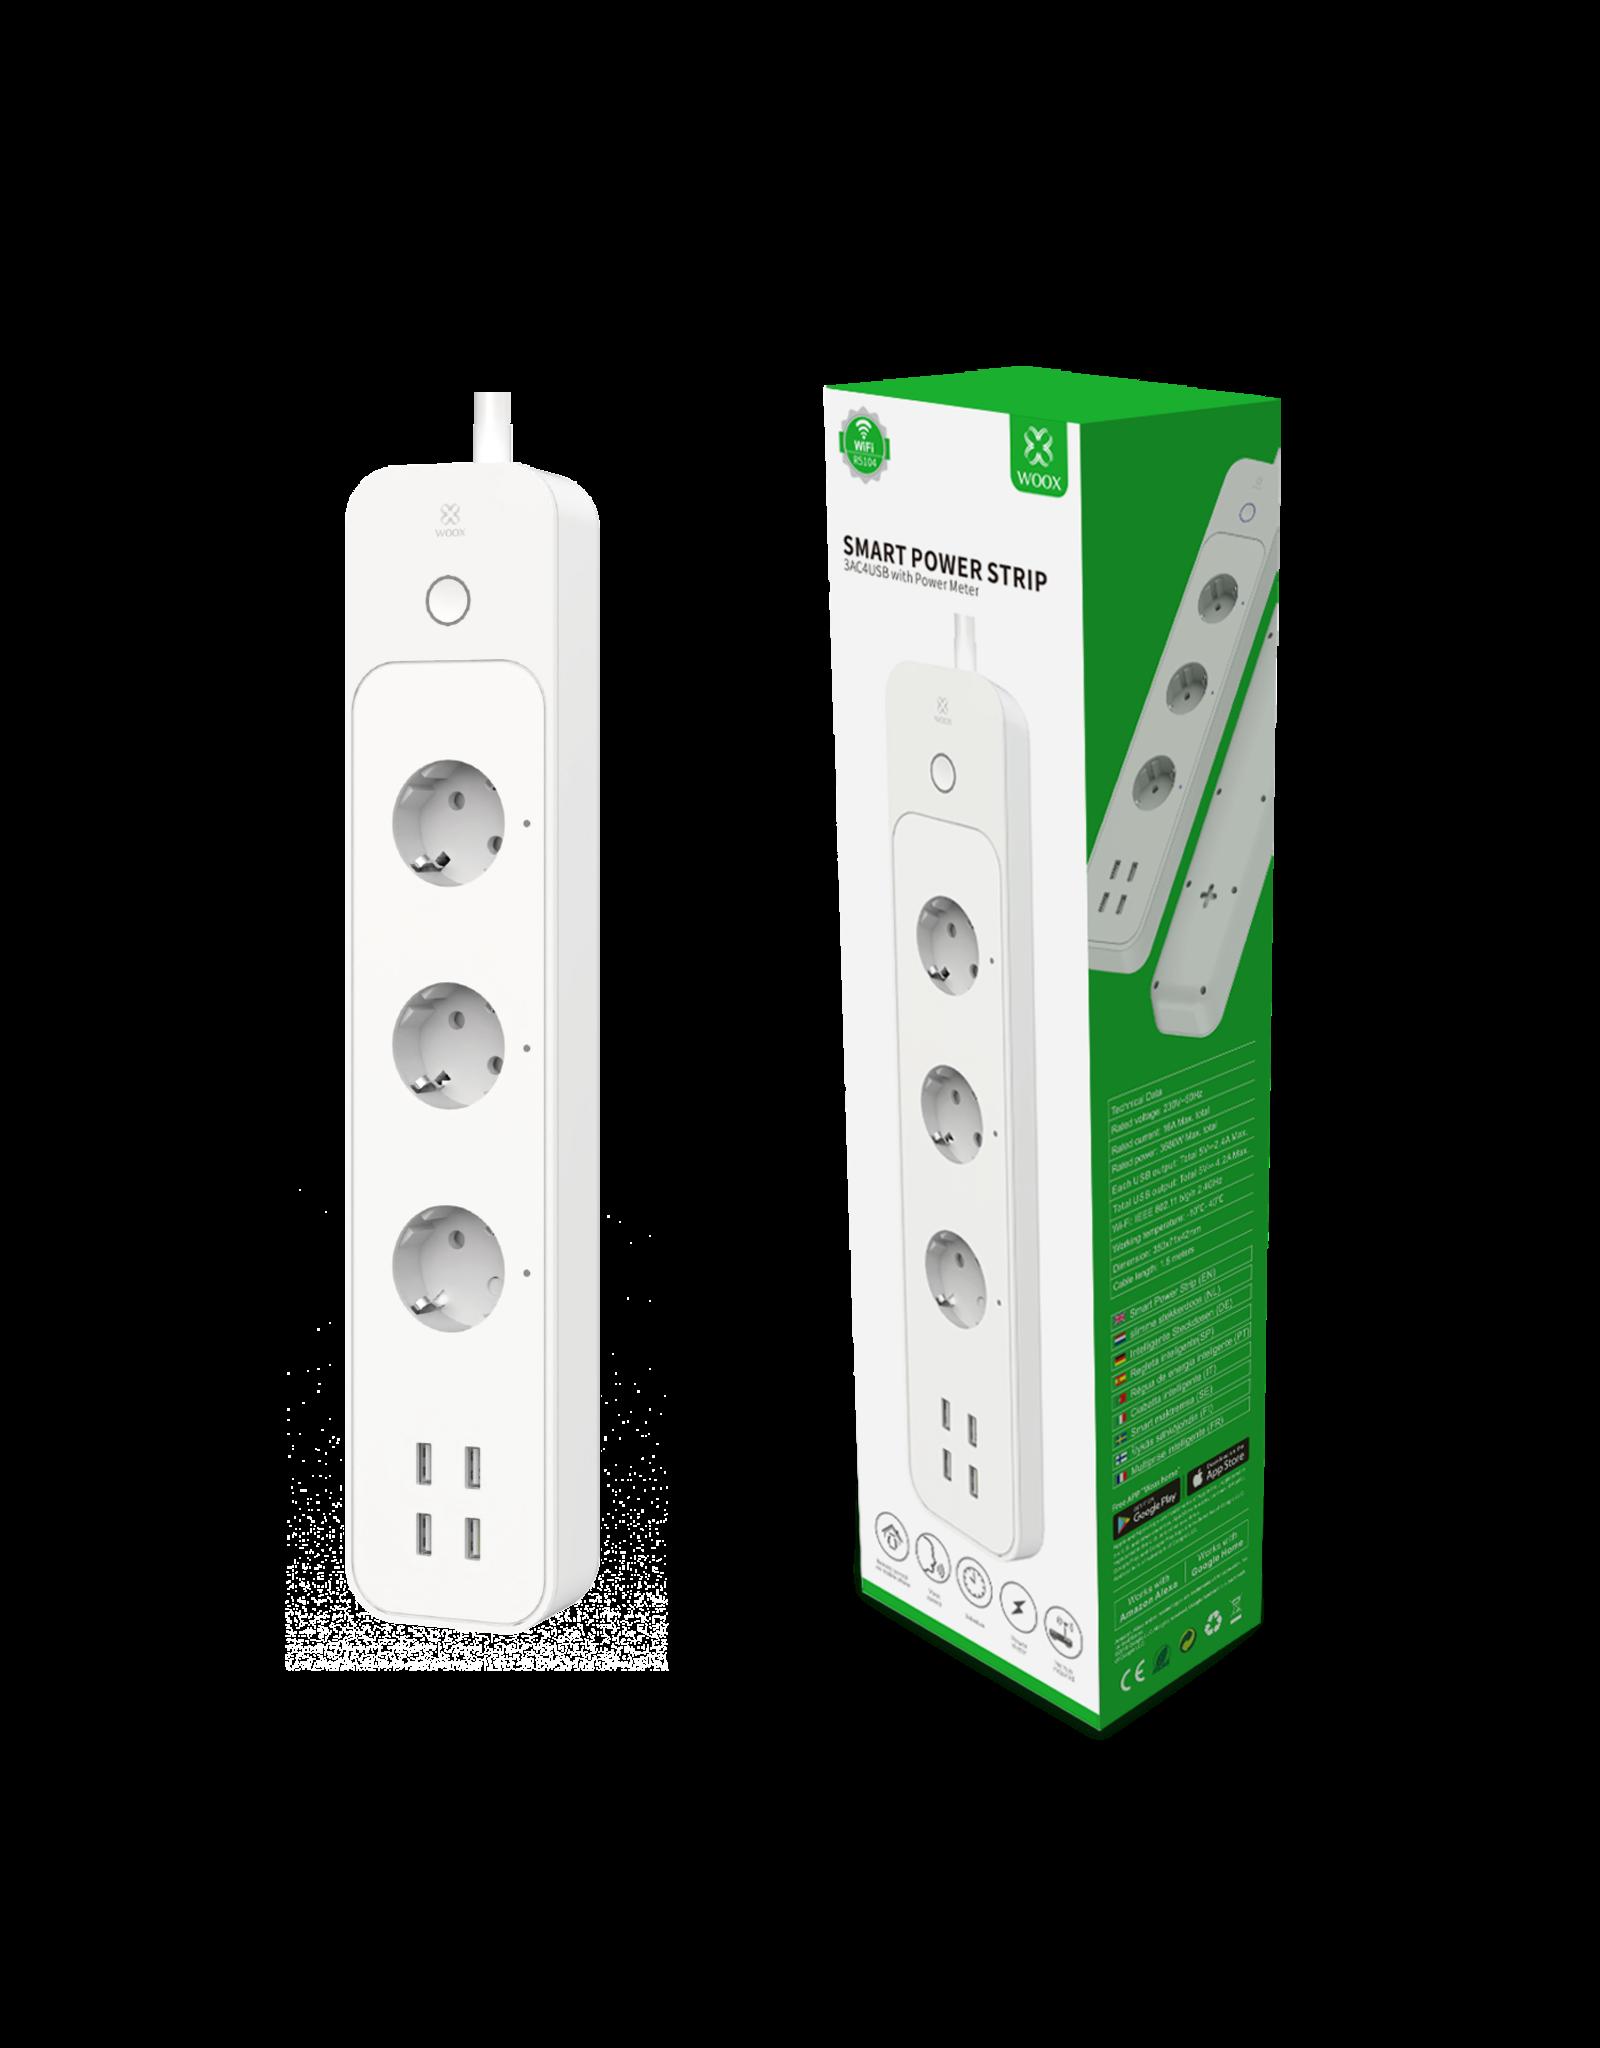 Woox Home Woox Smart Powerstrip Schucko EU | R5104